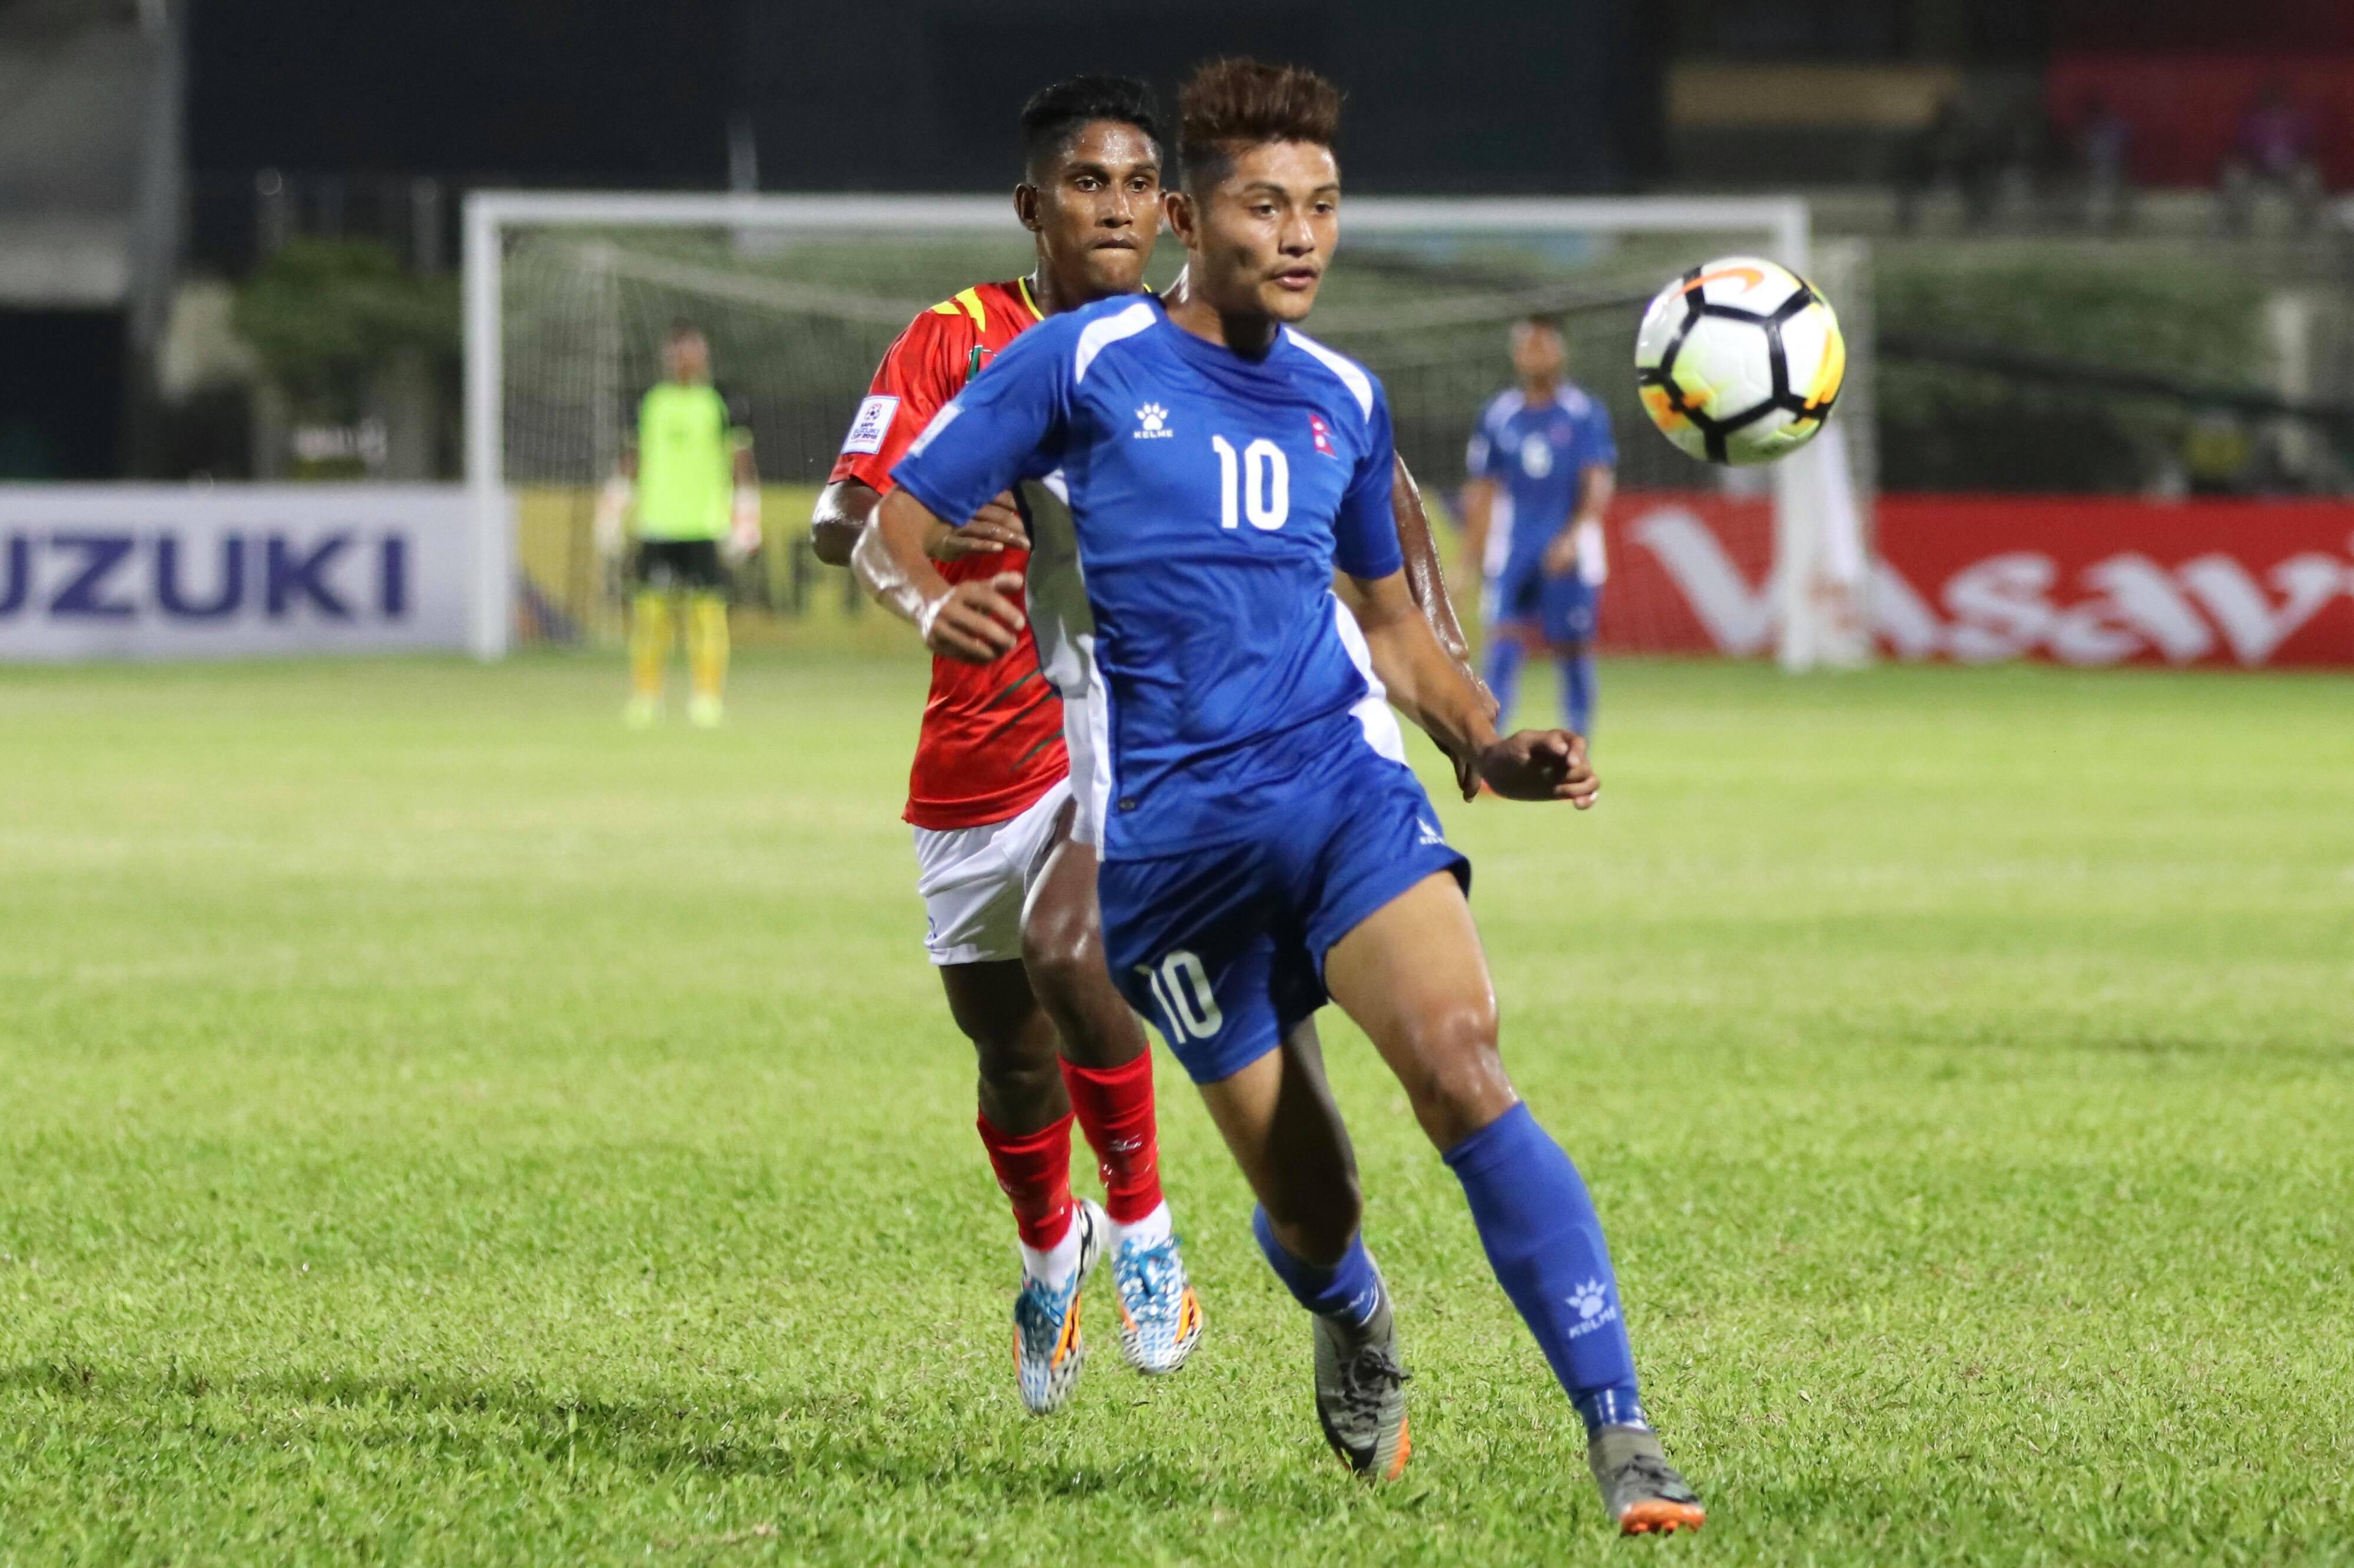 Nepalu2019s Bimal Gharti Magar (front) beats past a Bangladesh player during their Group A match of the SAFF Championship at the Bangabandhu National Stadium in Dhaka on Saturday, September 8, 2018. Photo: THT